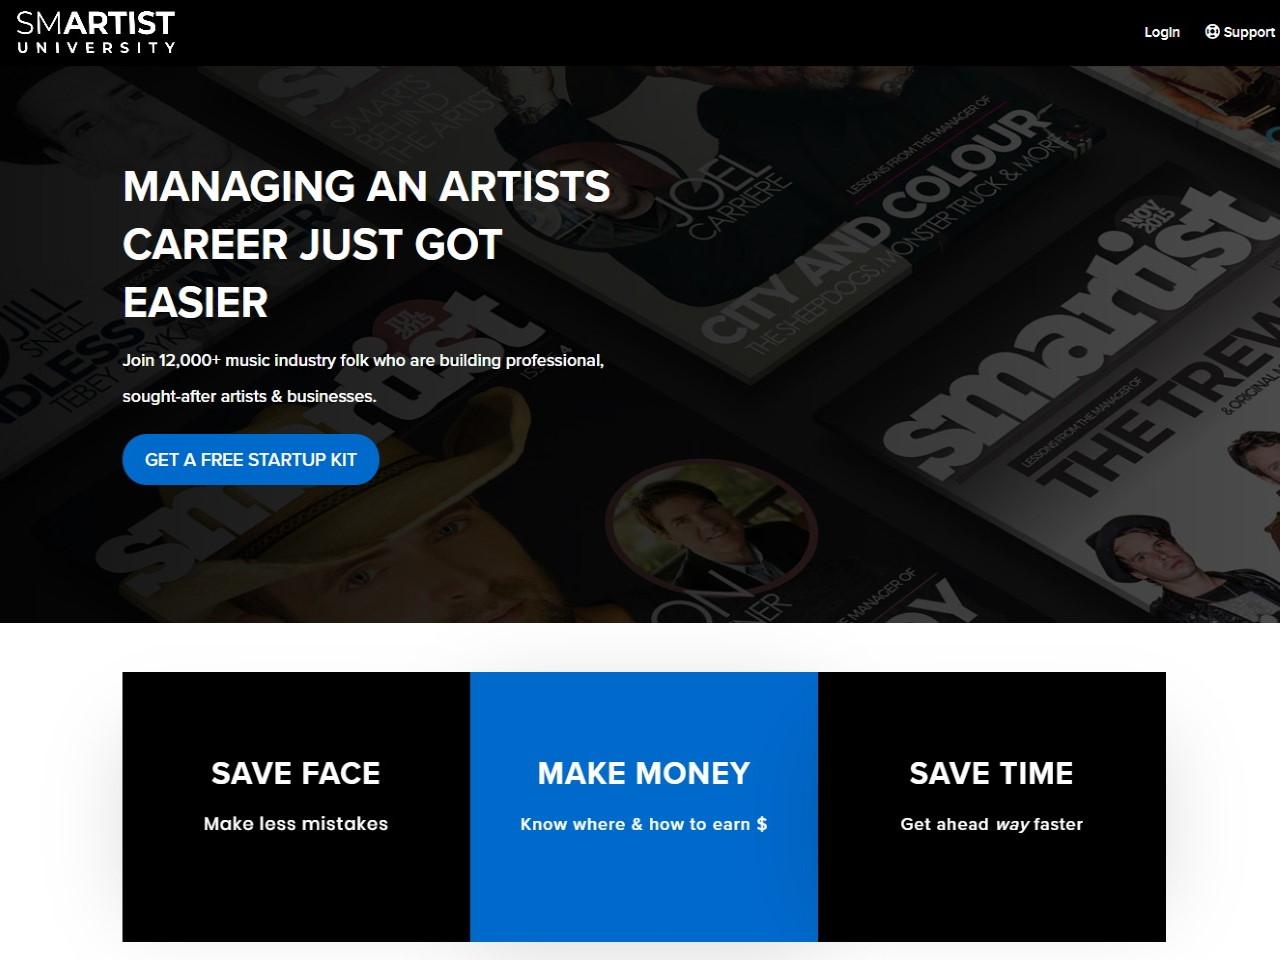 Smartist University The Future of Music Management Education